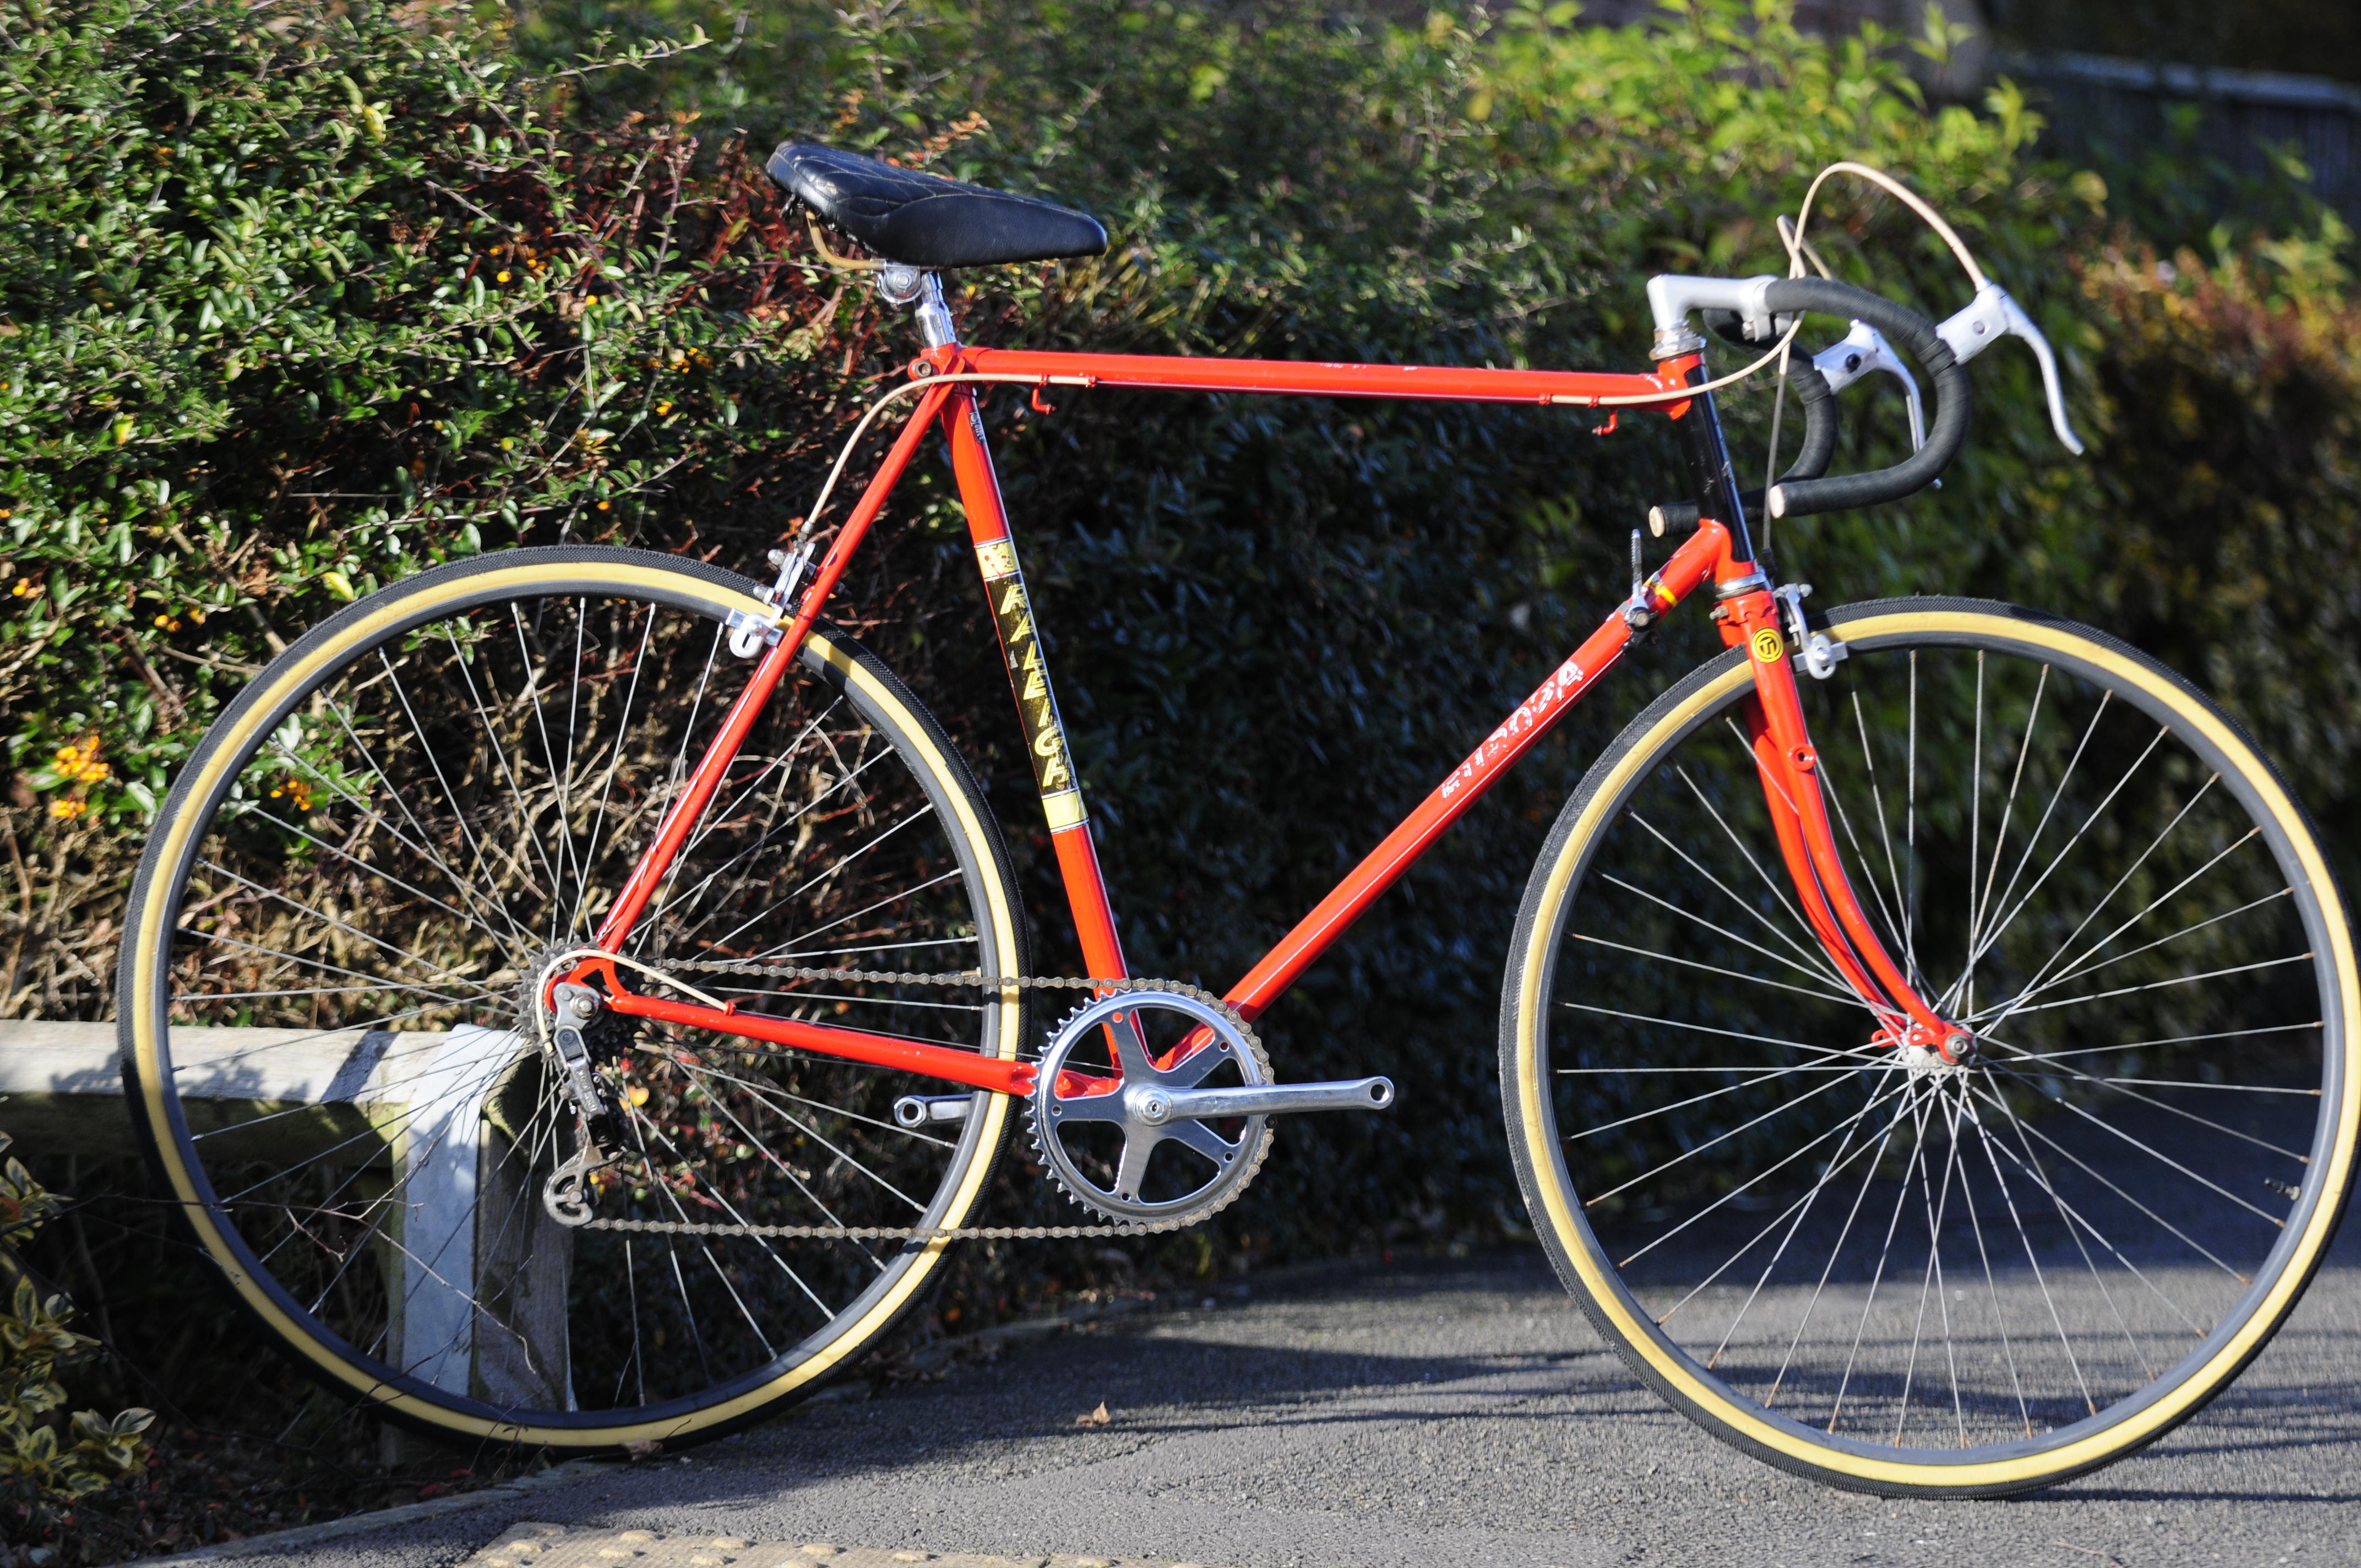 Raleigh Europa old bikes